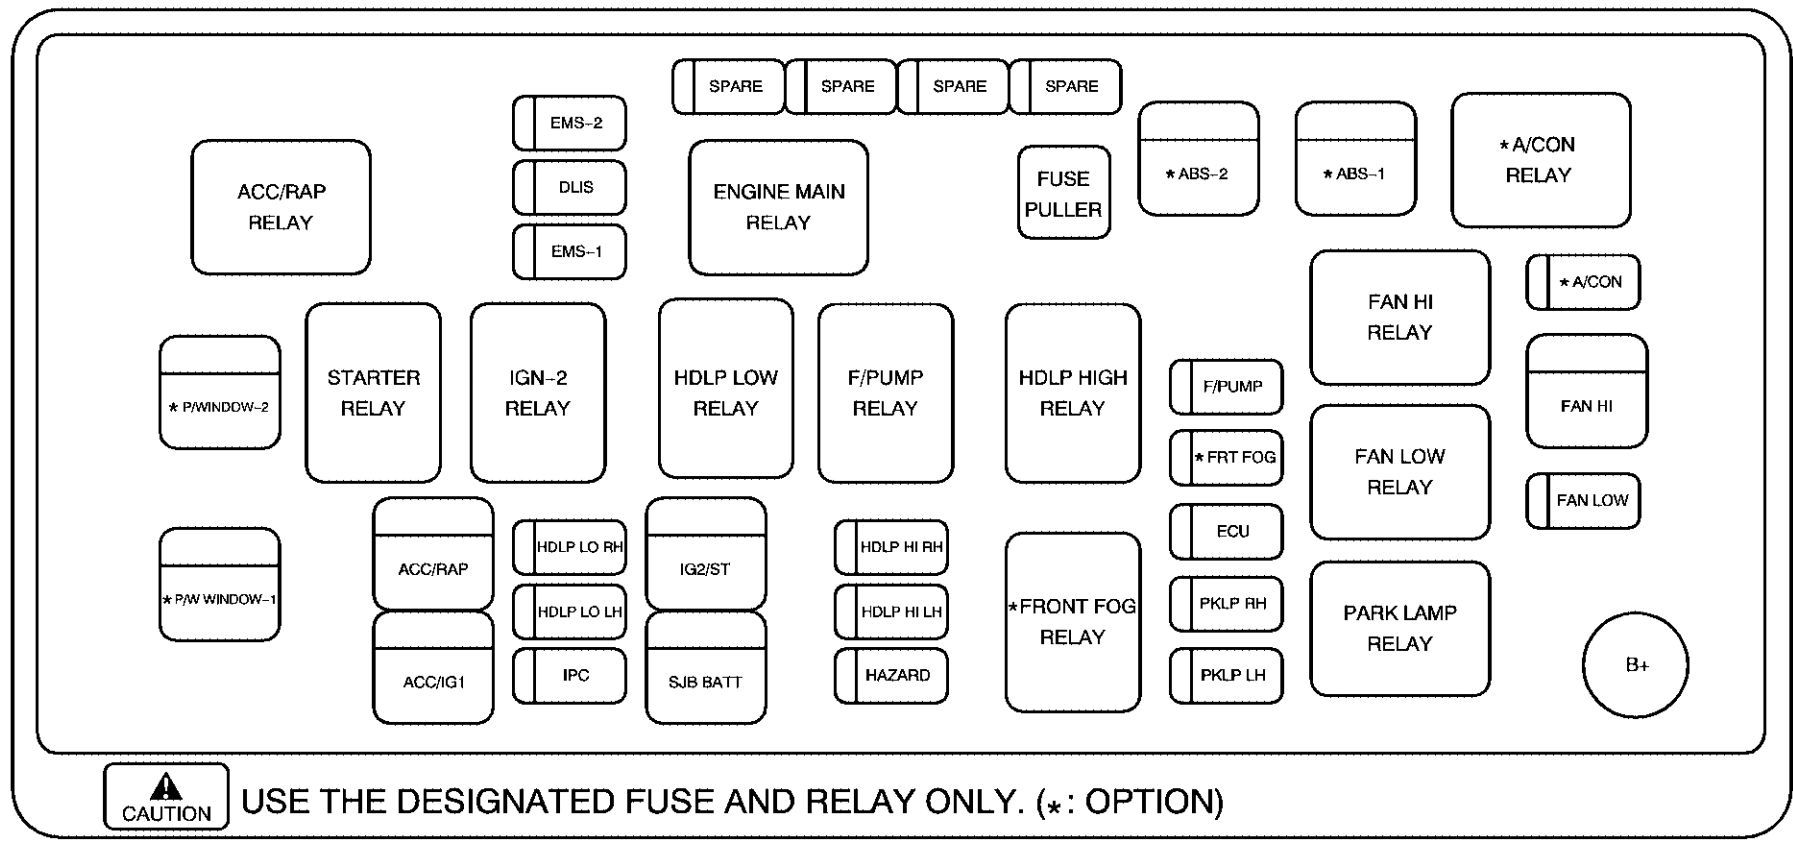 wa_4301] 2011 aveo fuse diagram download diagram  gue45 ologi emba mohammedshrine librar wiring 101